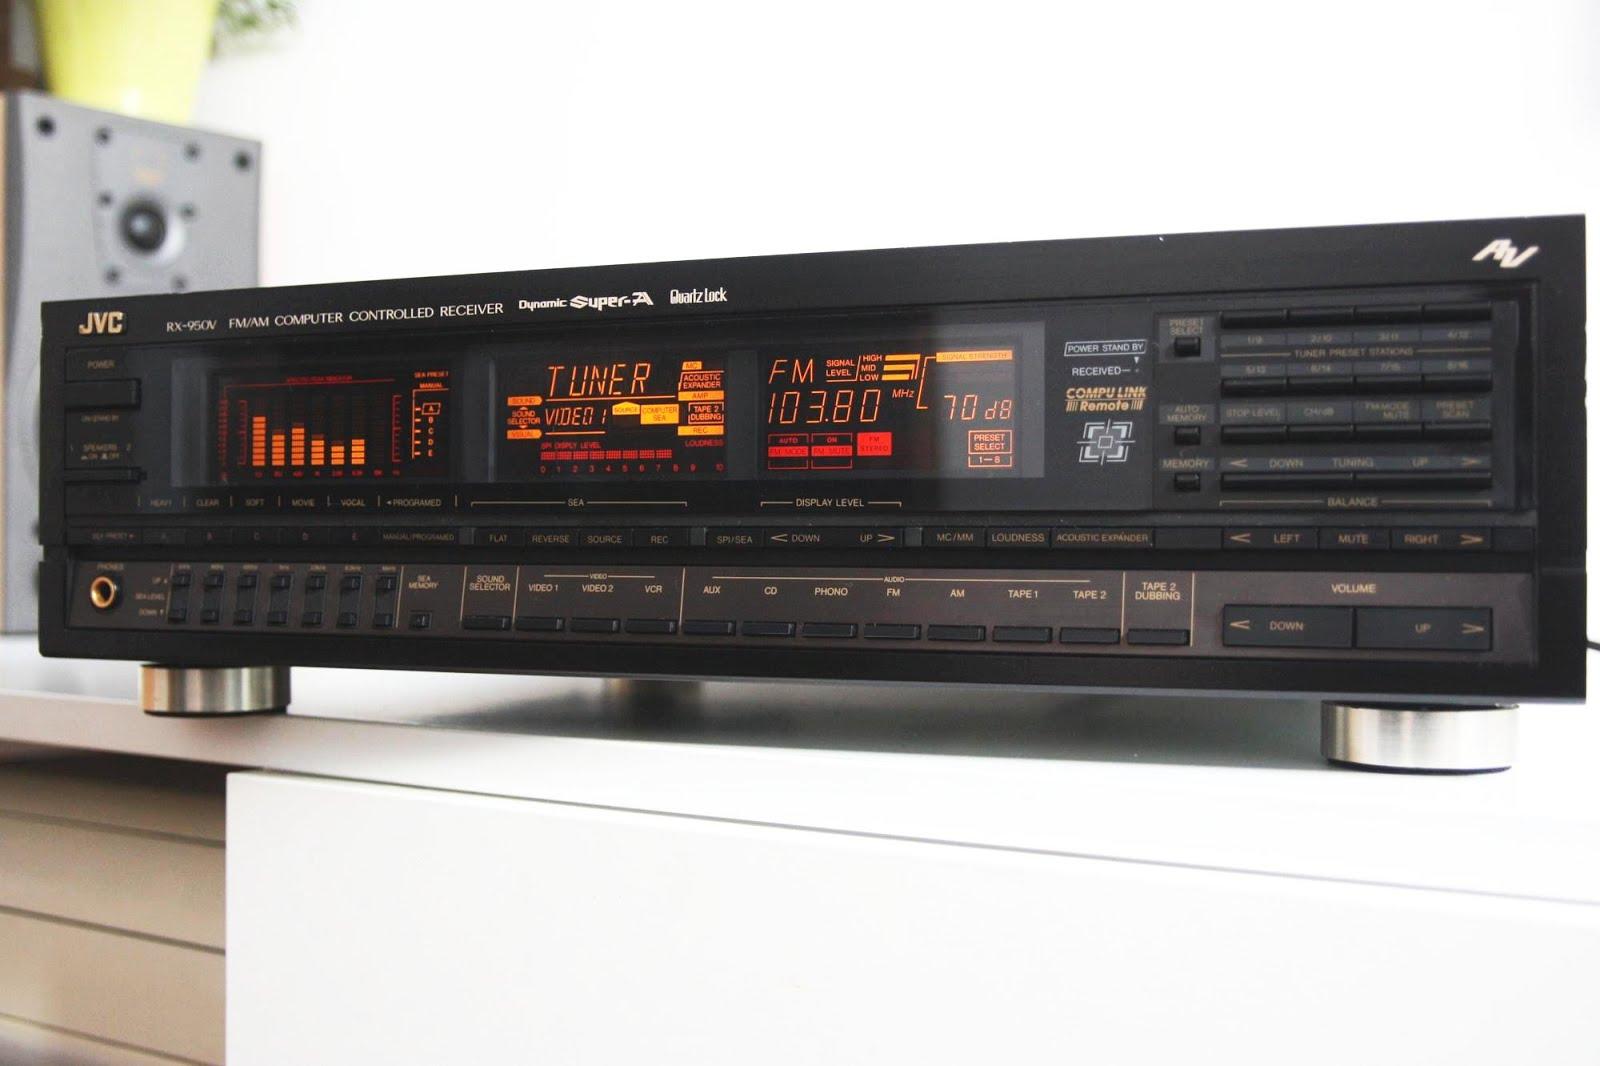 Jvc amplifier Manual Rx 884v